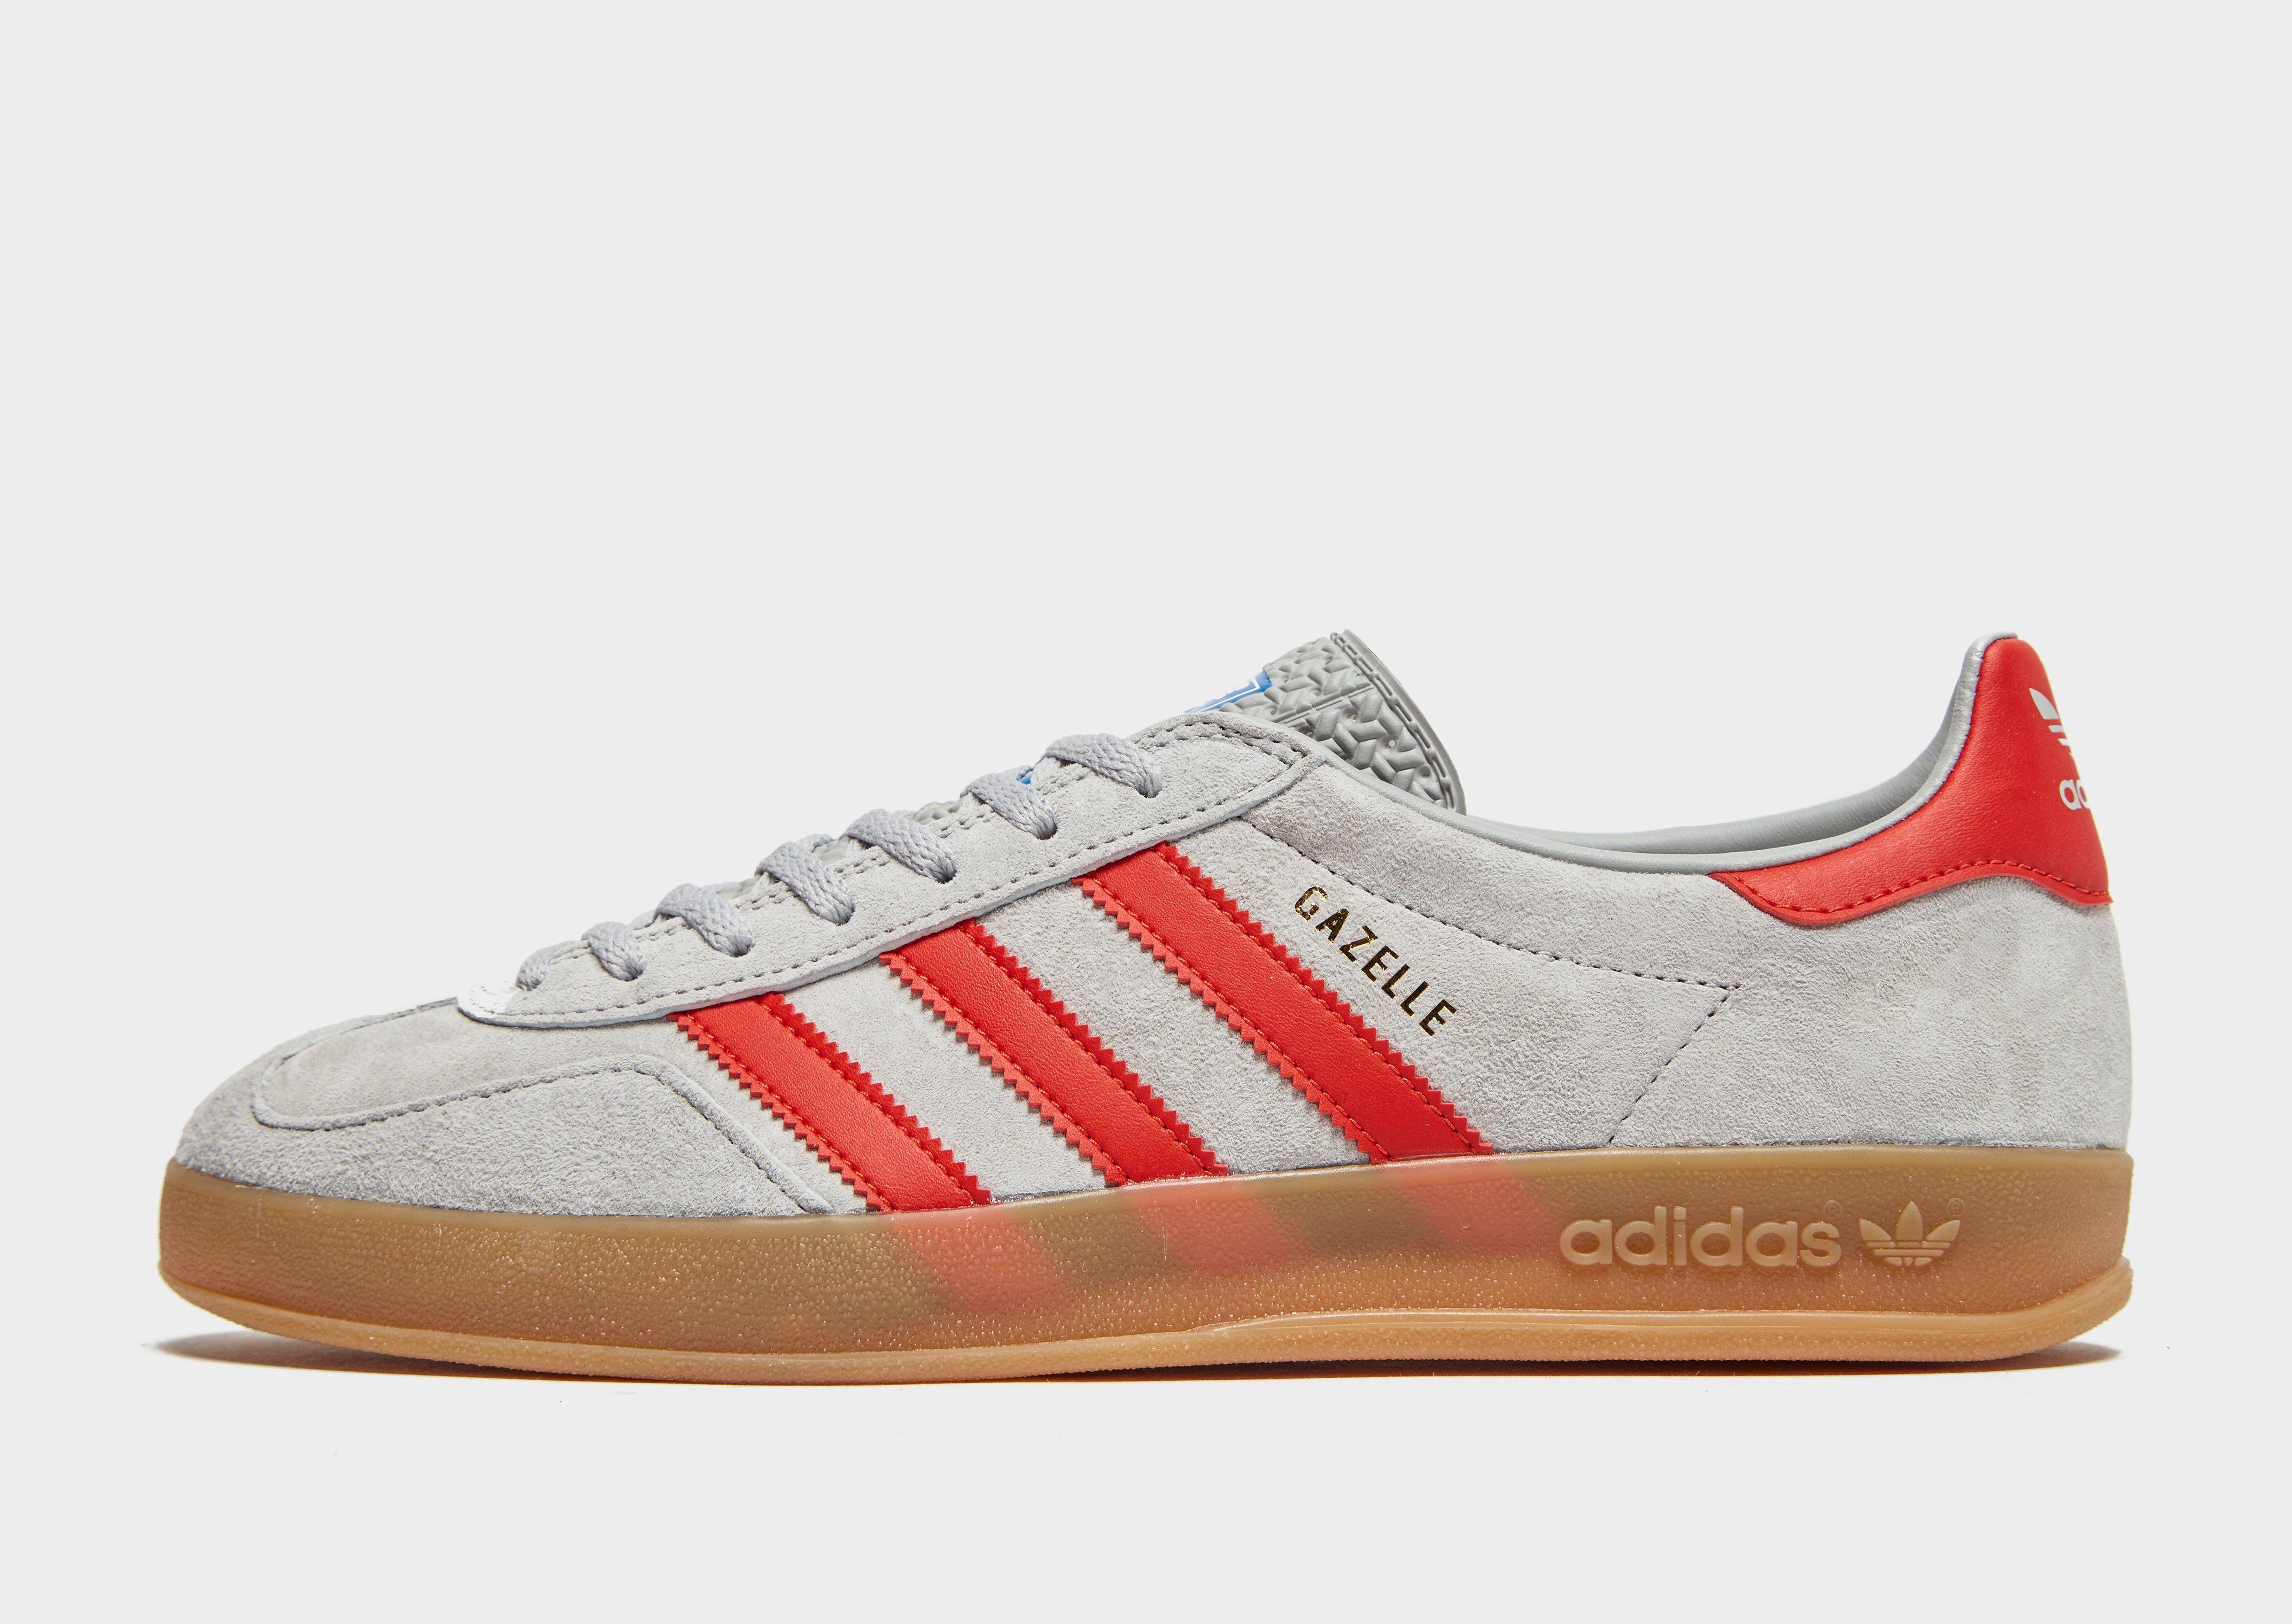 Royaume-Uni disponibilité 1f052 fdbad adidas Originals Gazelle Indoor Shoes | JD Sports